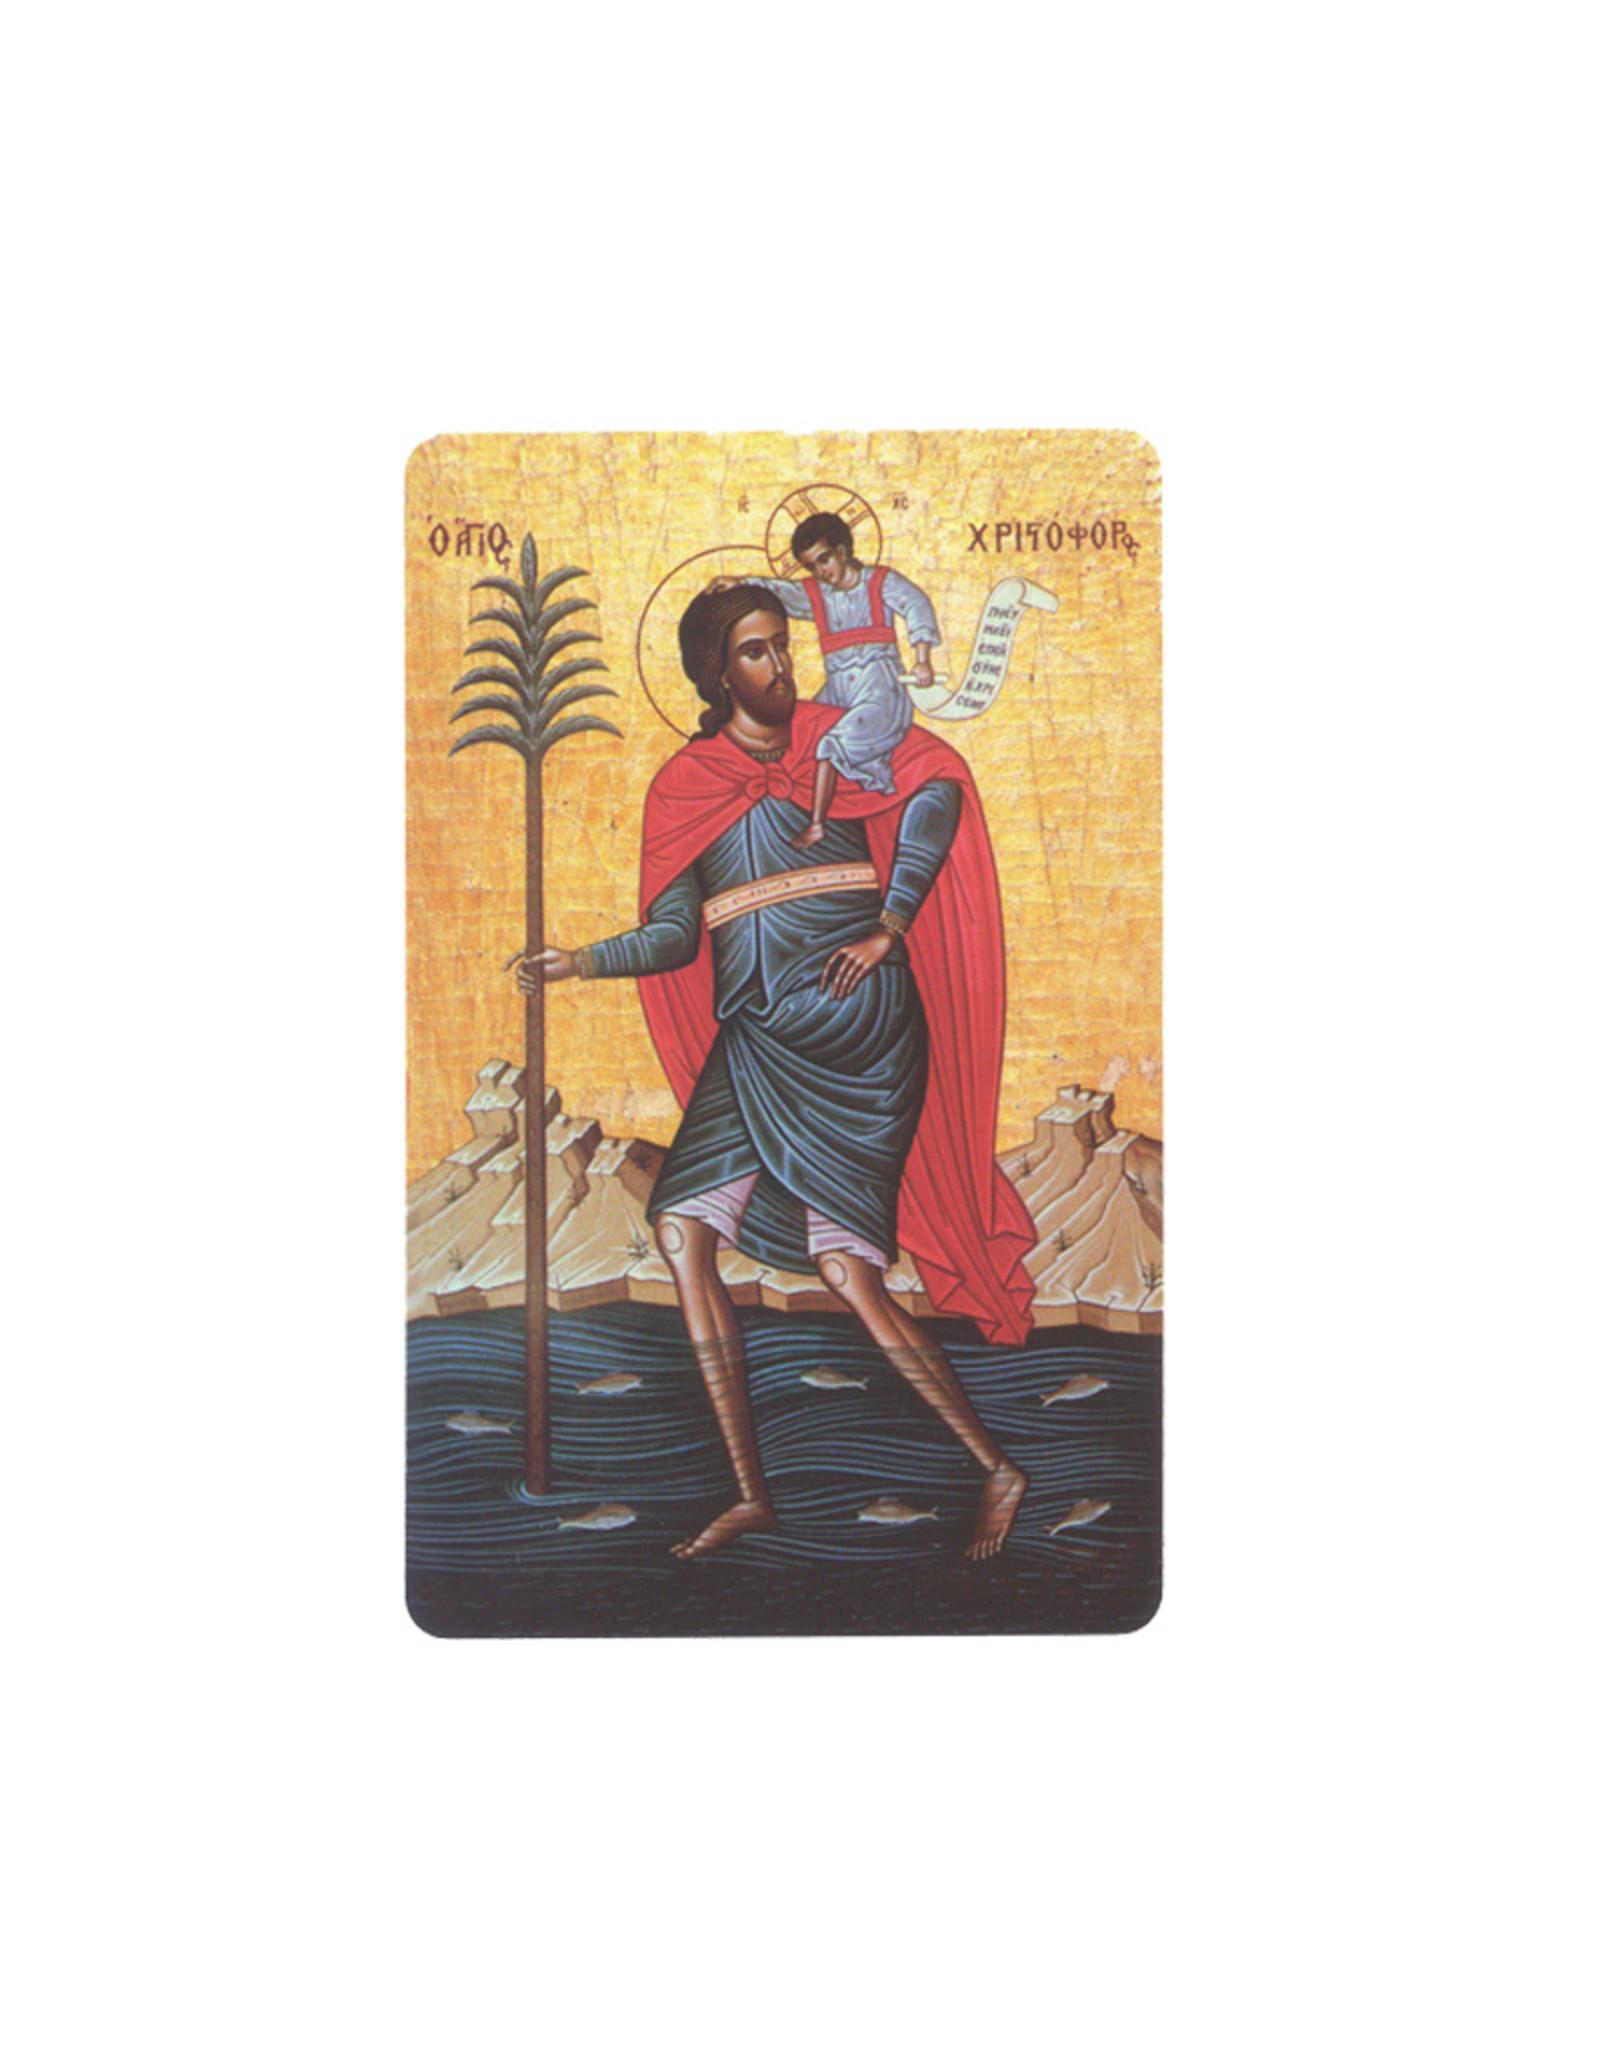 Saint Christopher prayer card